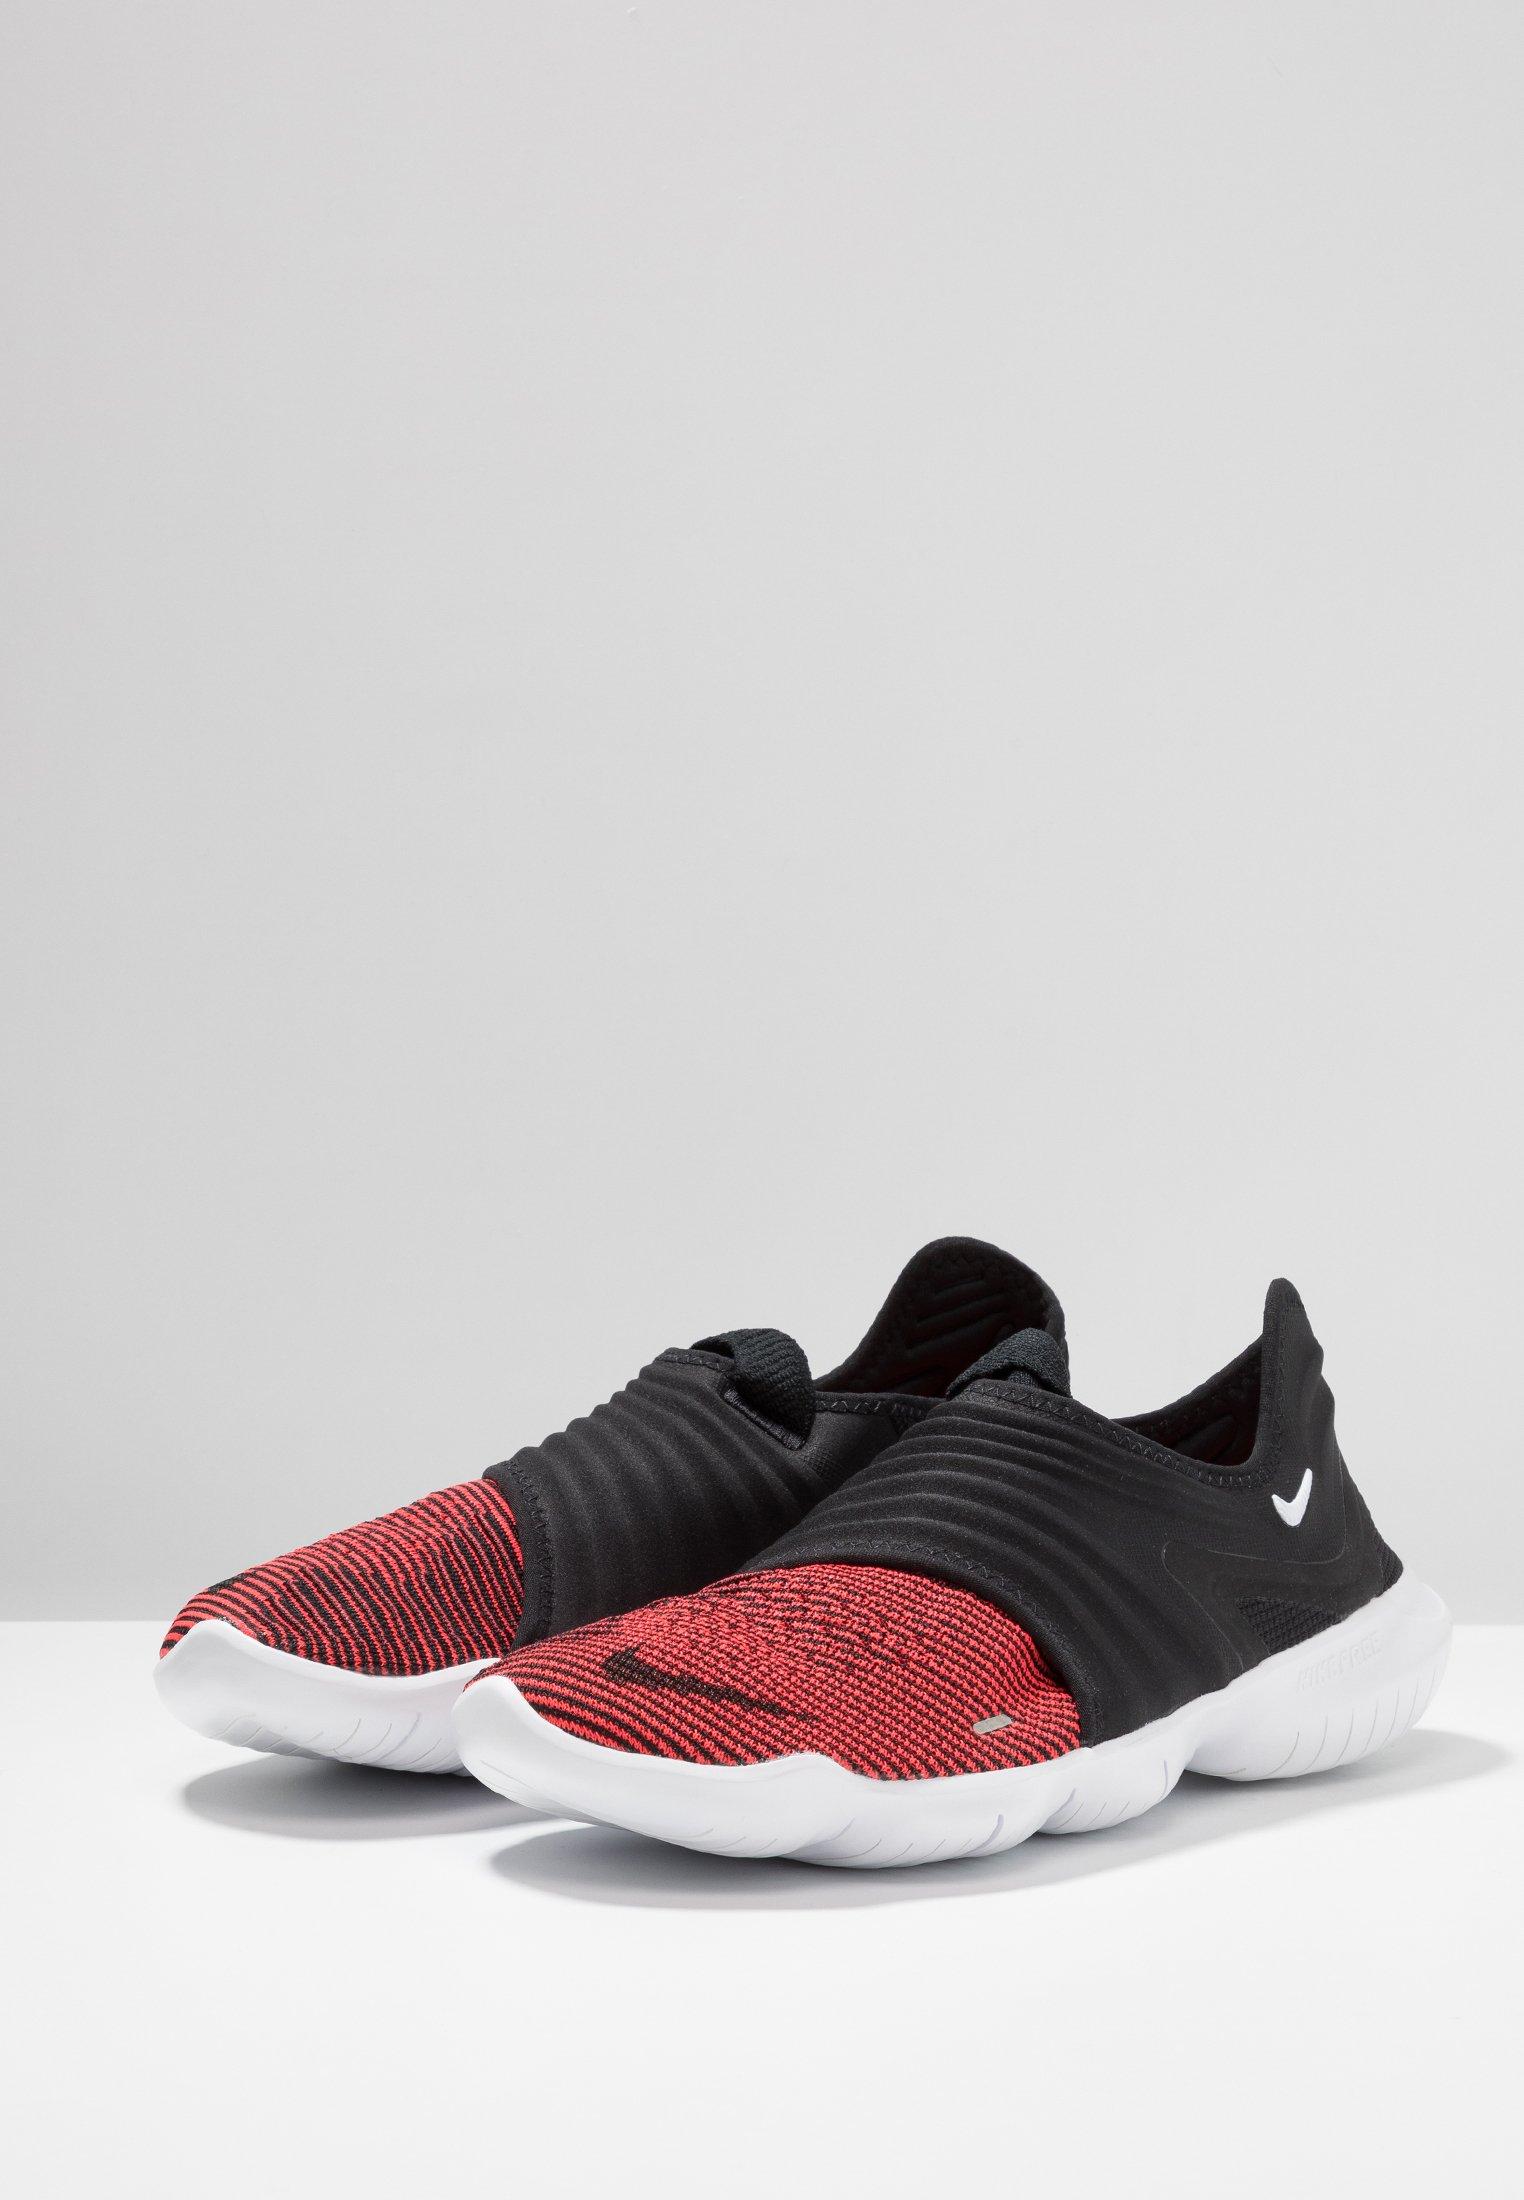 Free Neutres Crimson white Black 0Chaussures bright 3 Rn Nike De Course Performance Flyknit hdCQstr